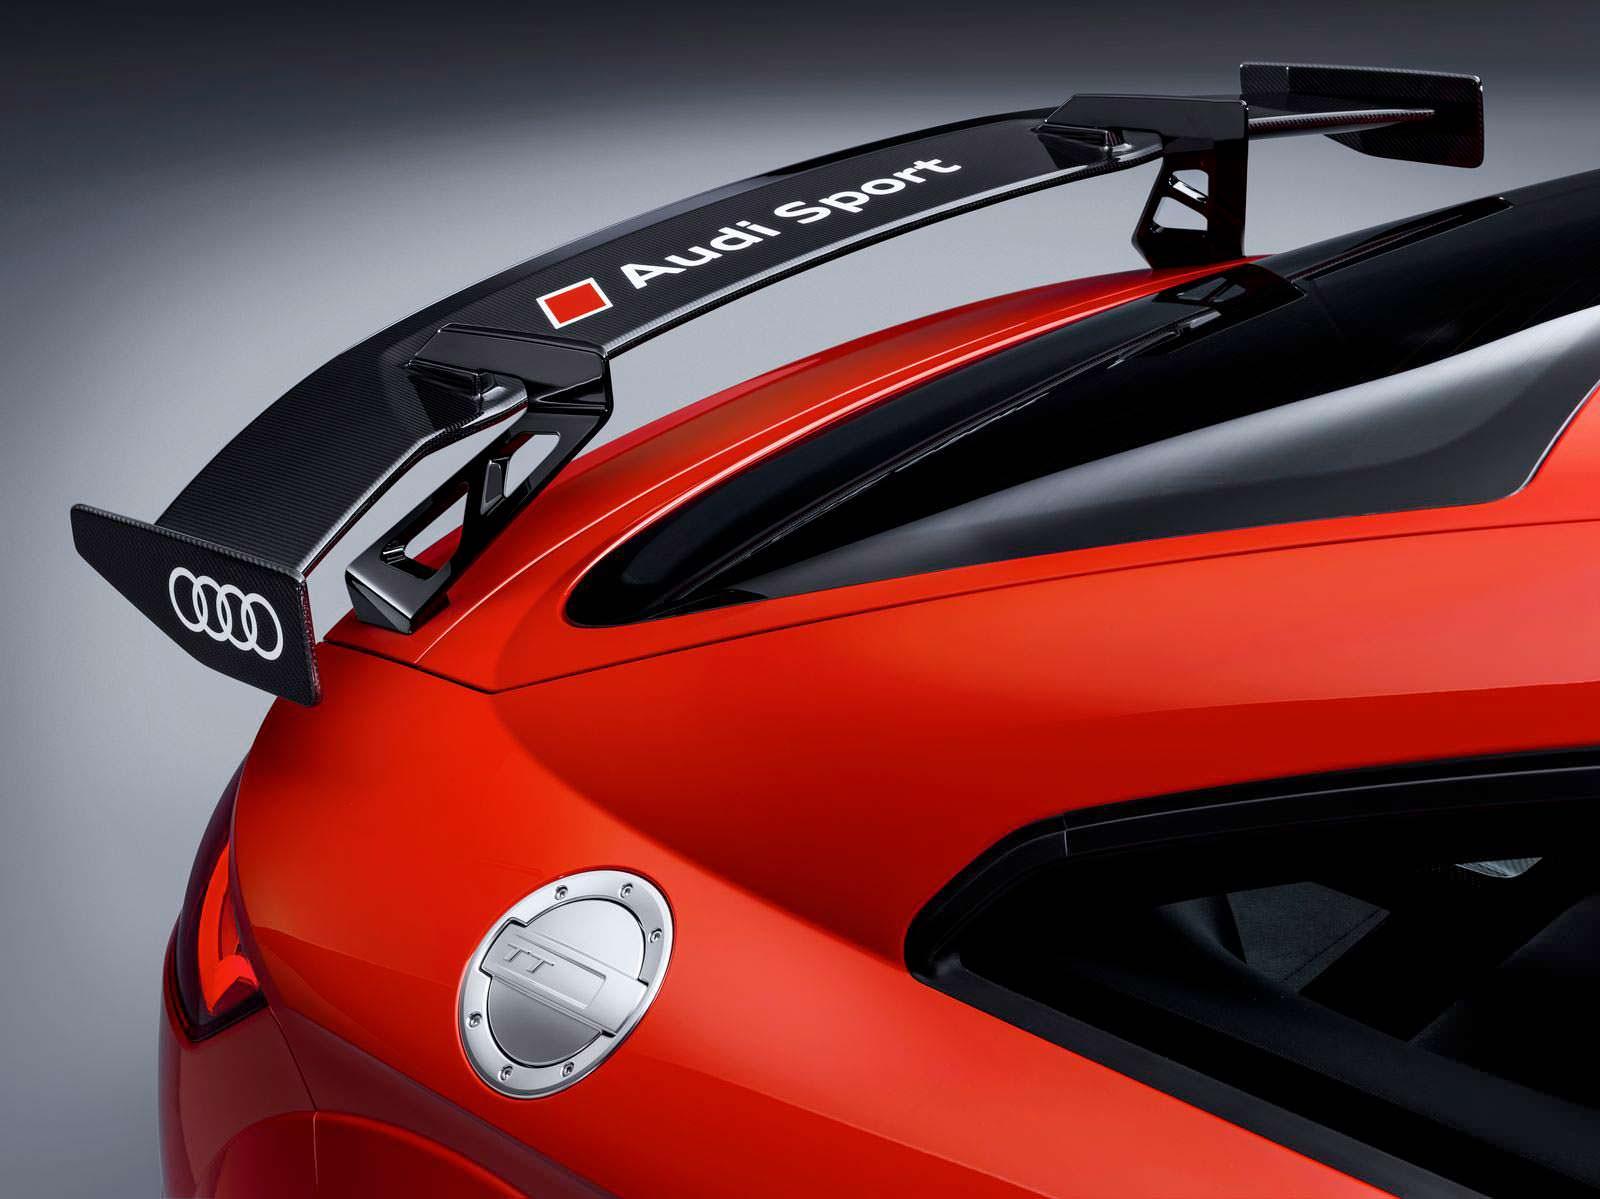 Карбоновое антикрыло Audi TT RS Performance